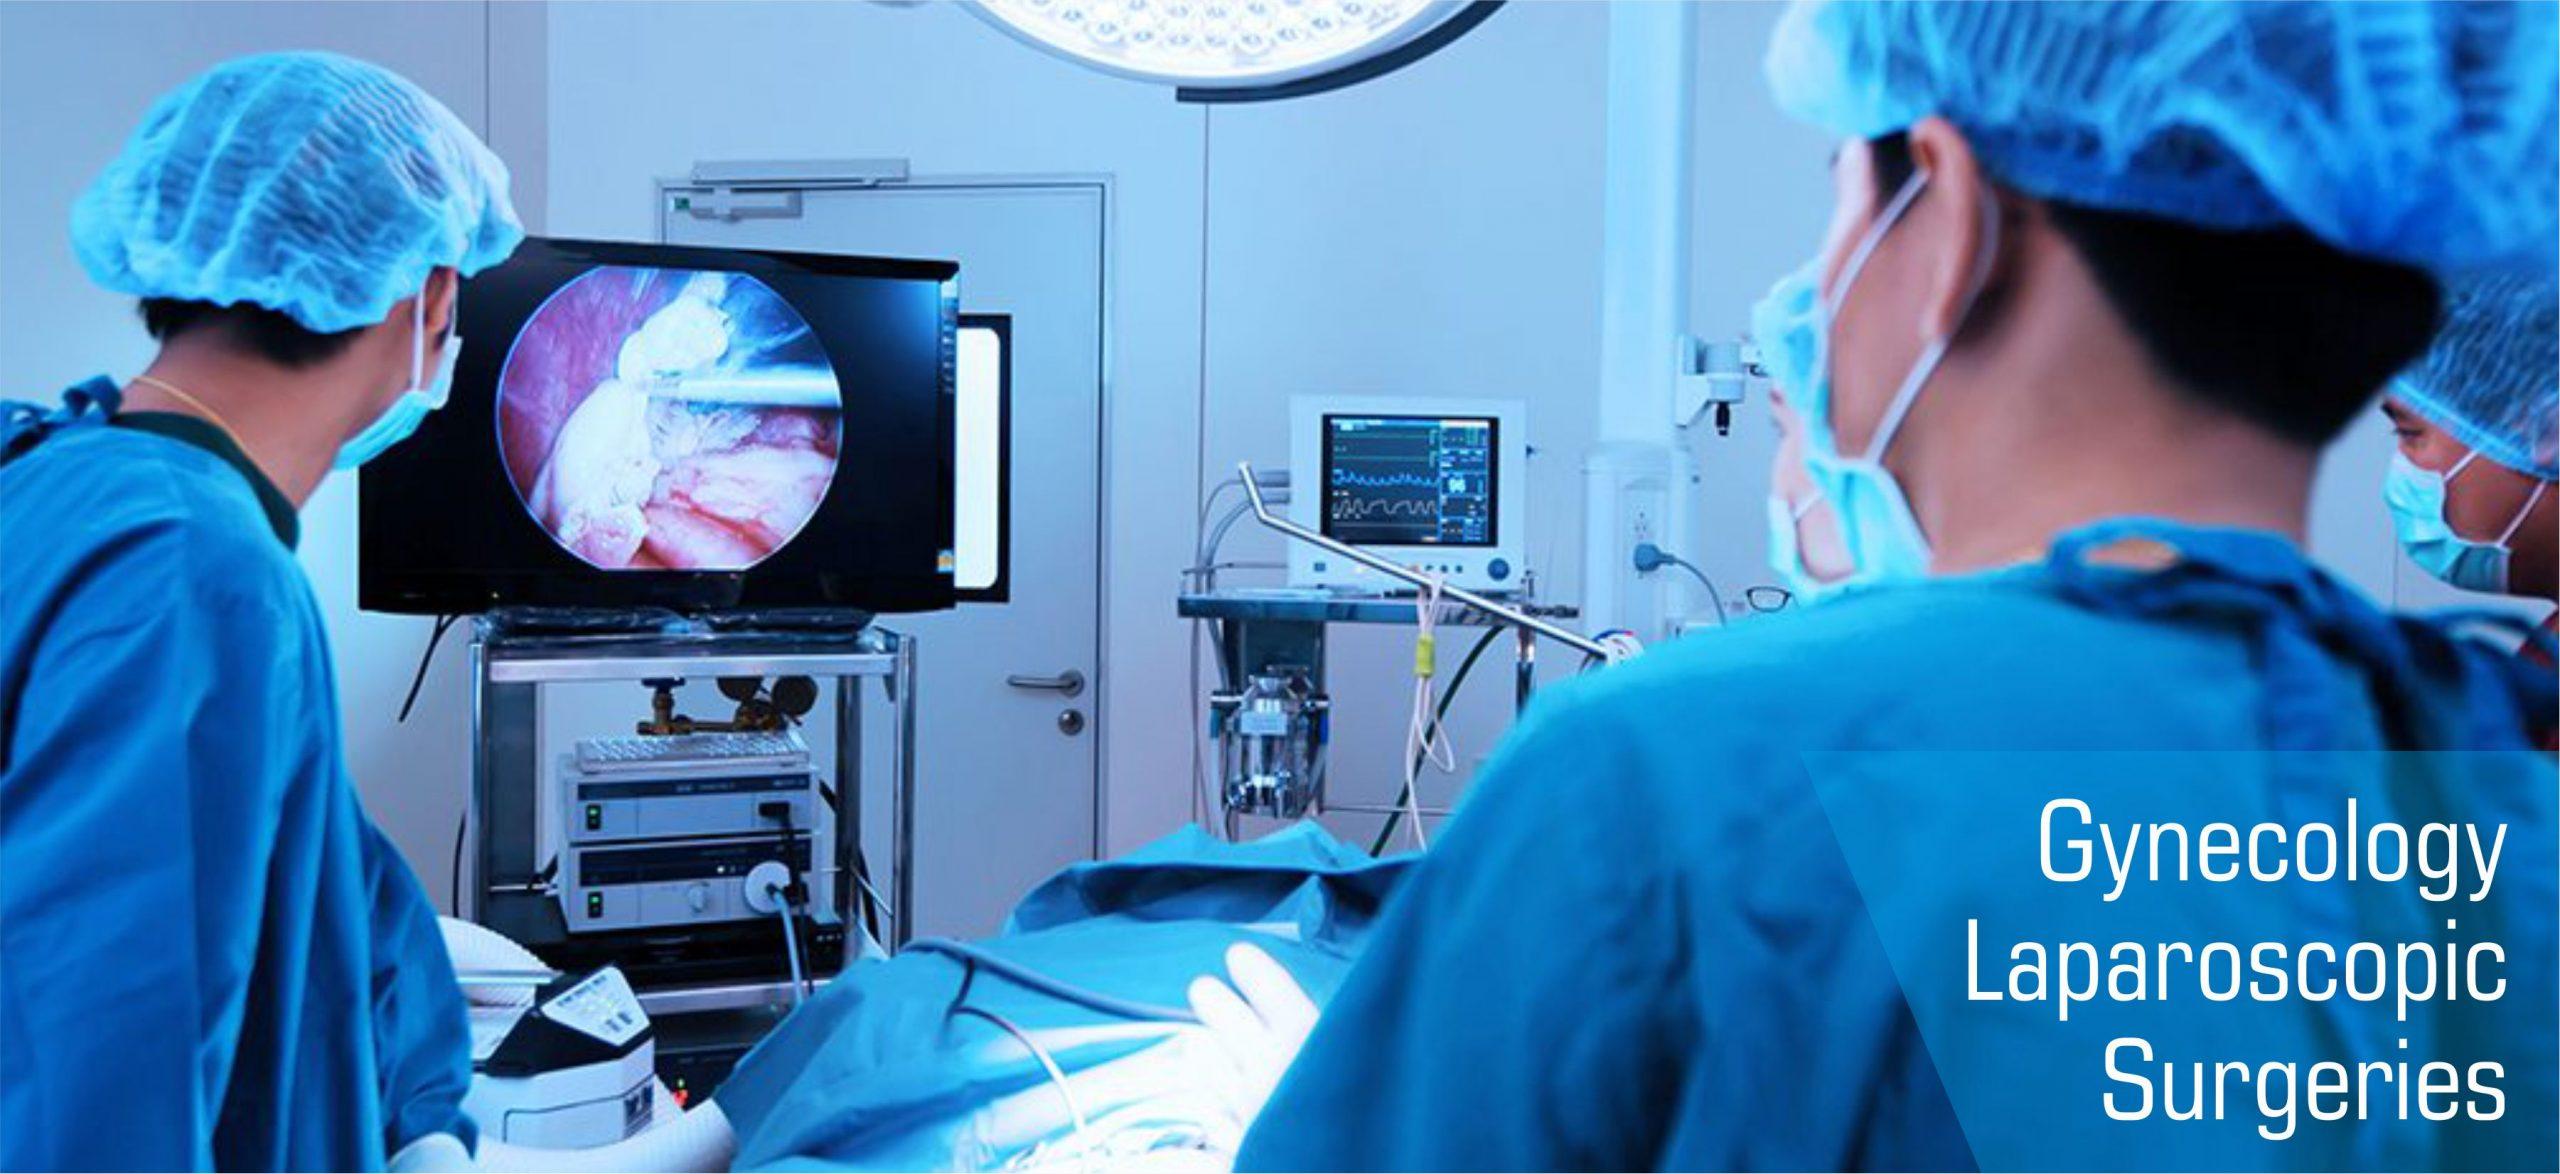 Advanced laparoscopic surgery 4